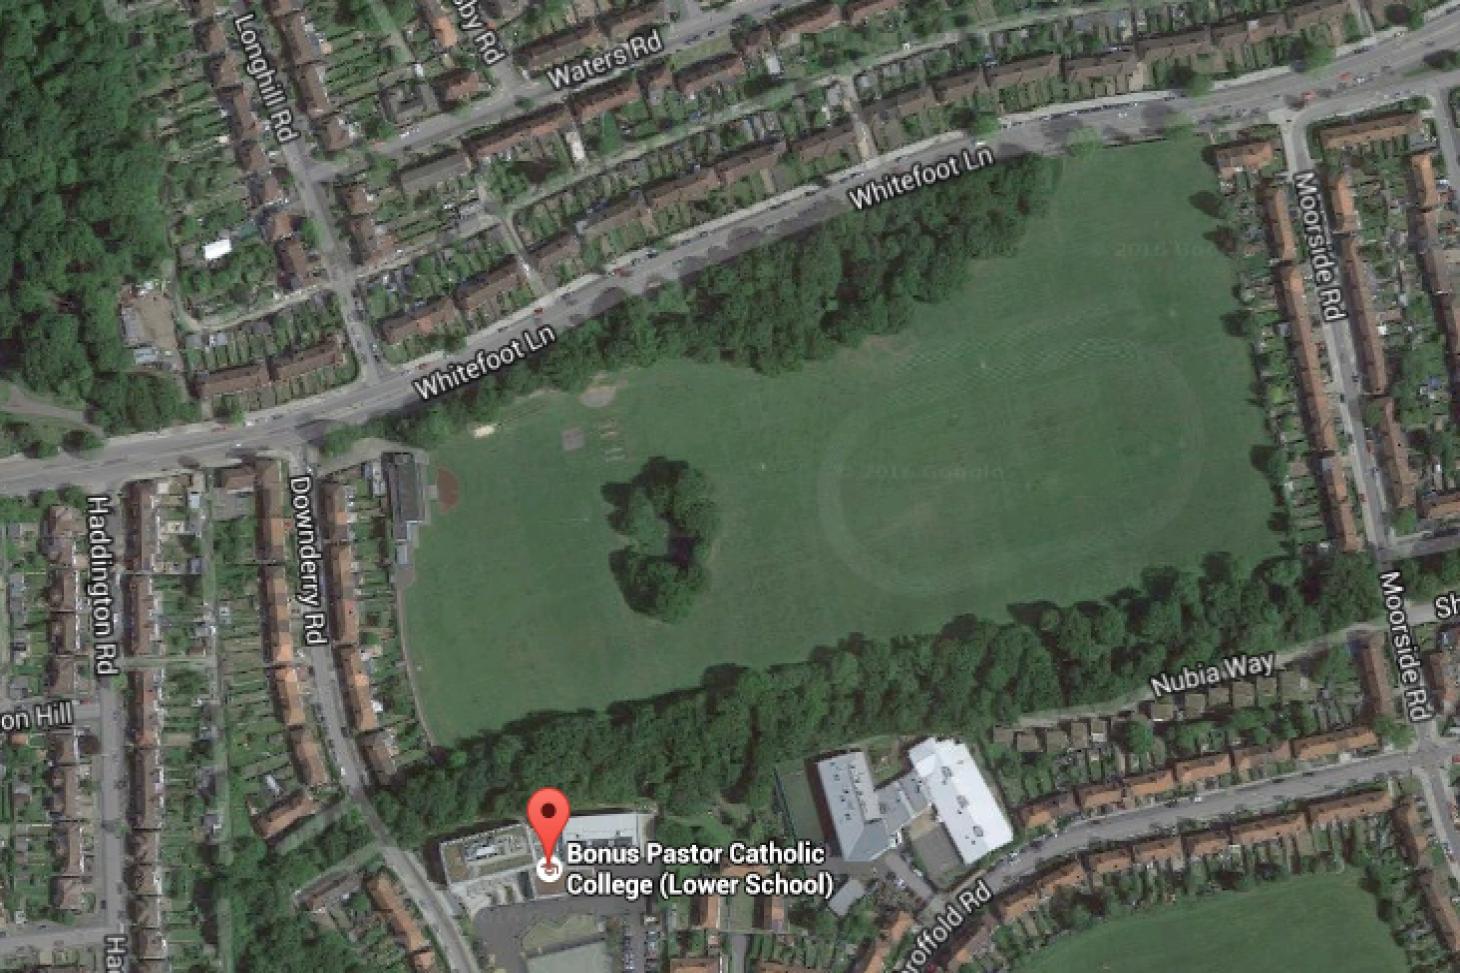 Bonus Pastor Catholic College 11 a side | Grass football pitch